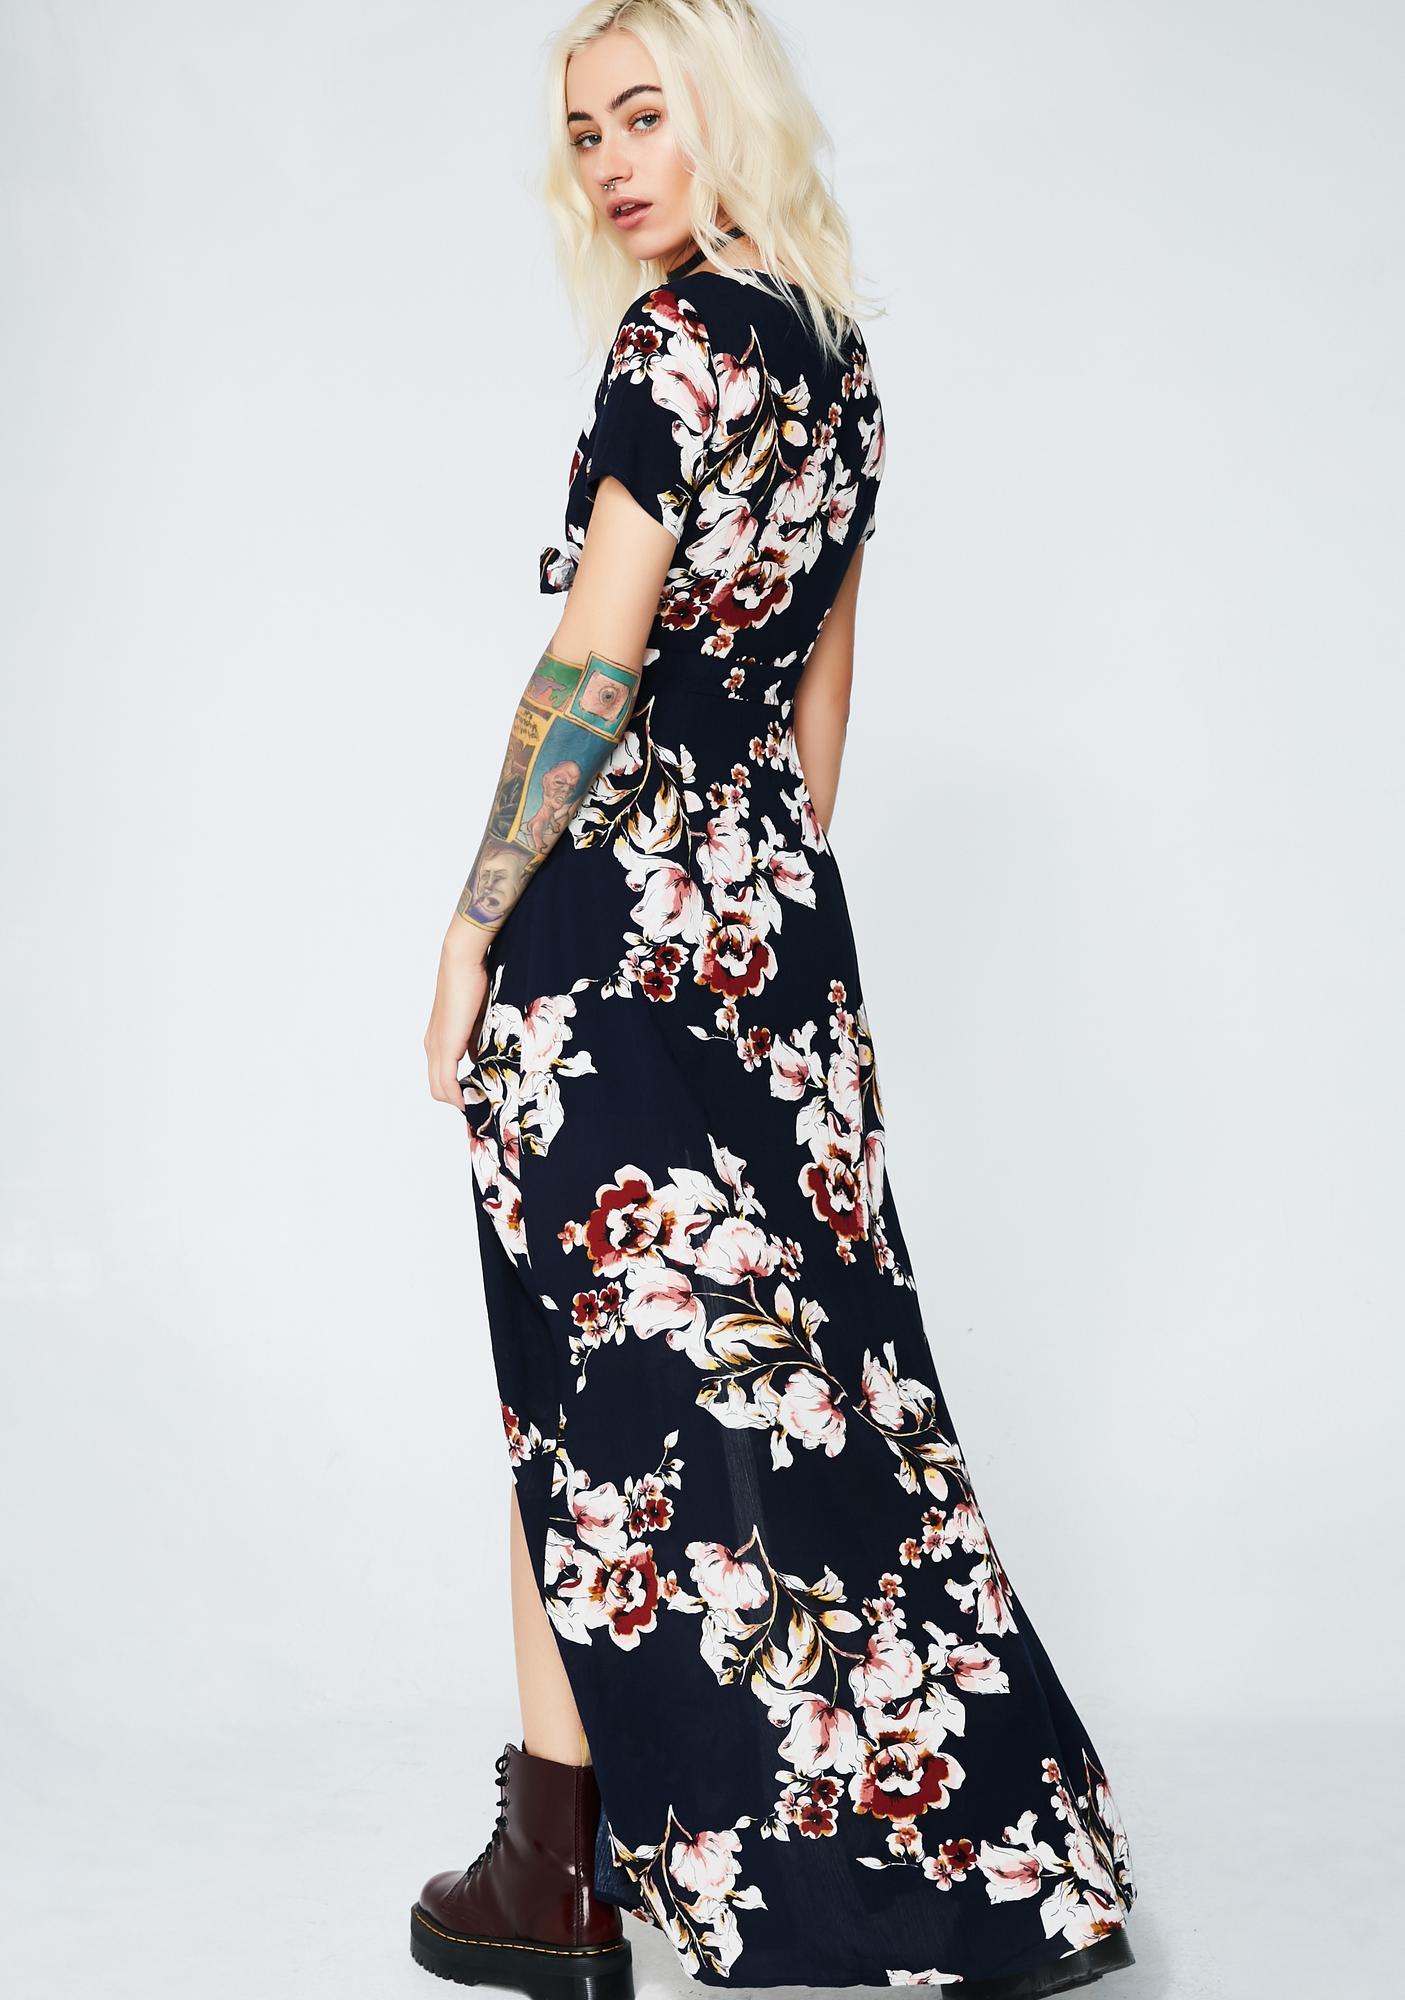 Floral Fantasies Maxi Dress